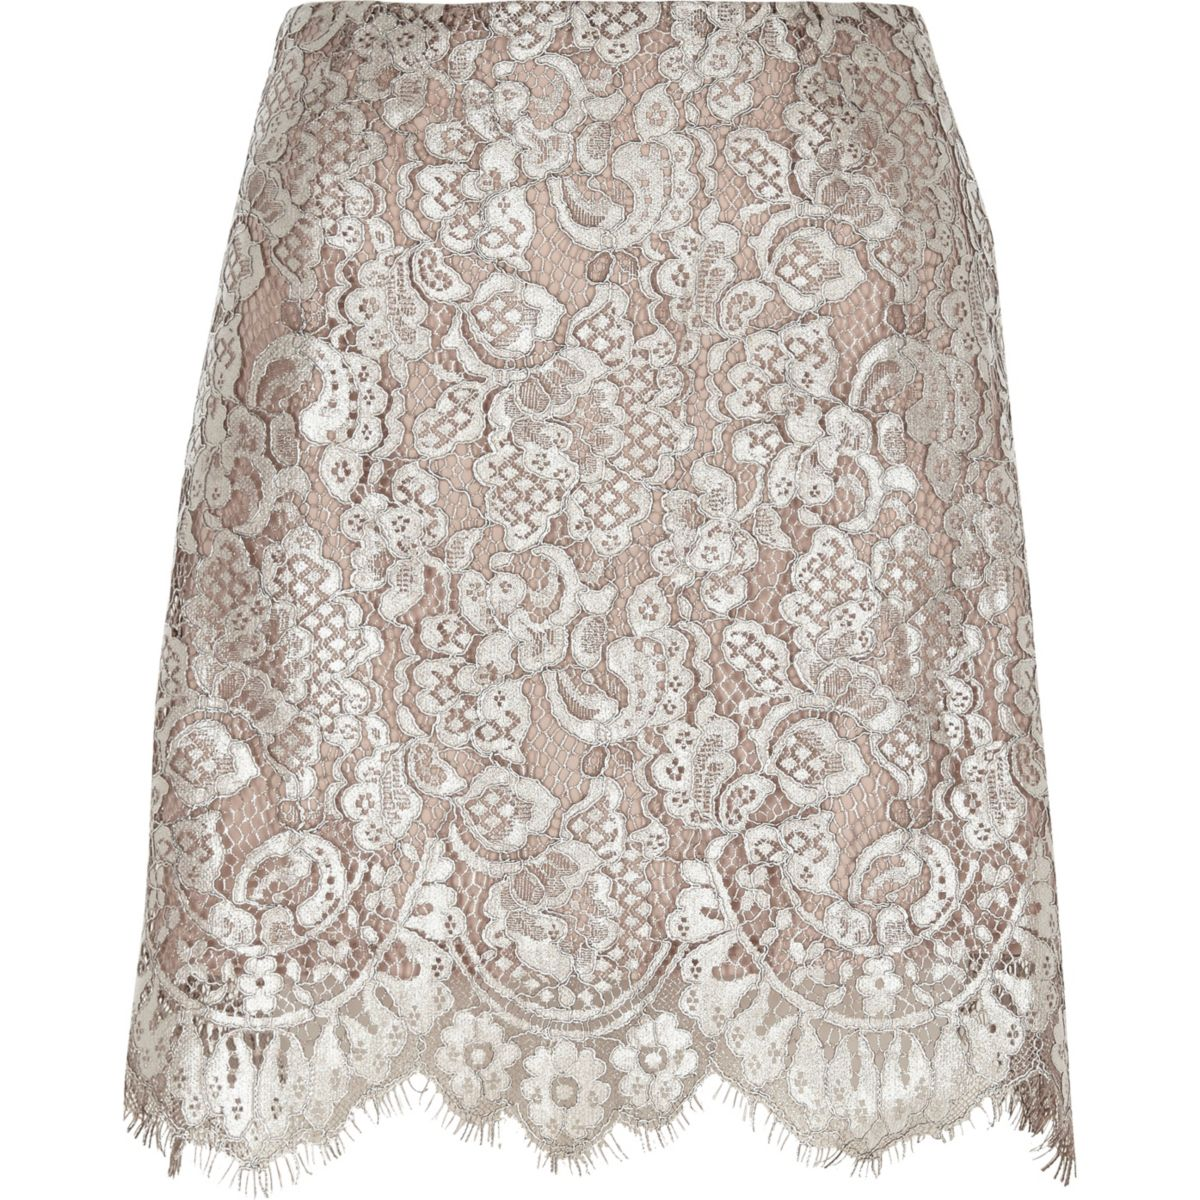 Silver metallic lace mini skirt